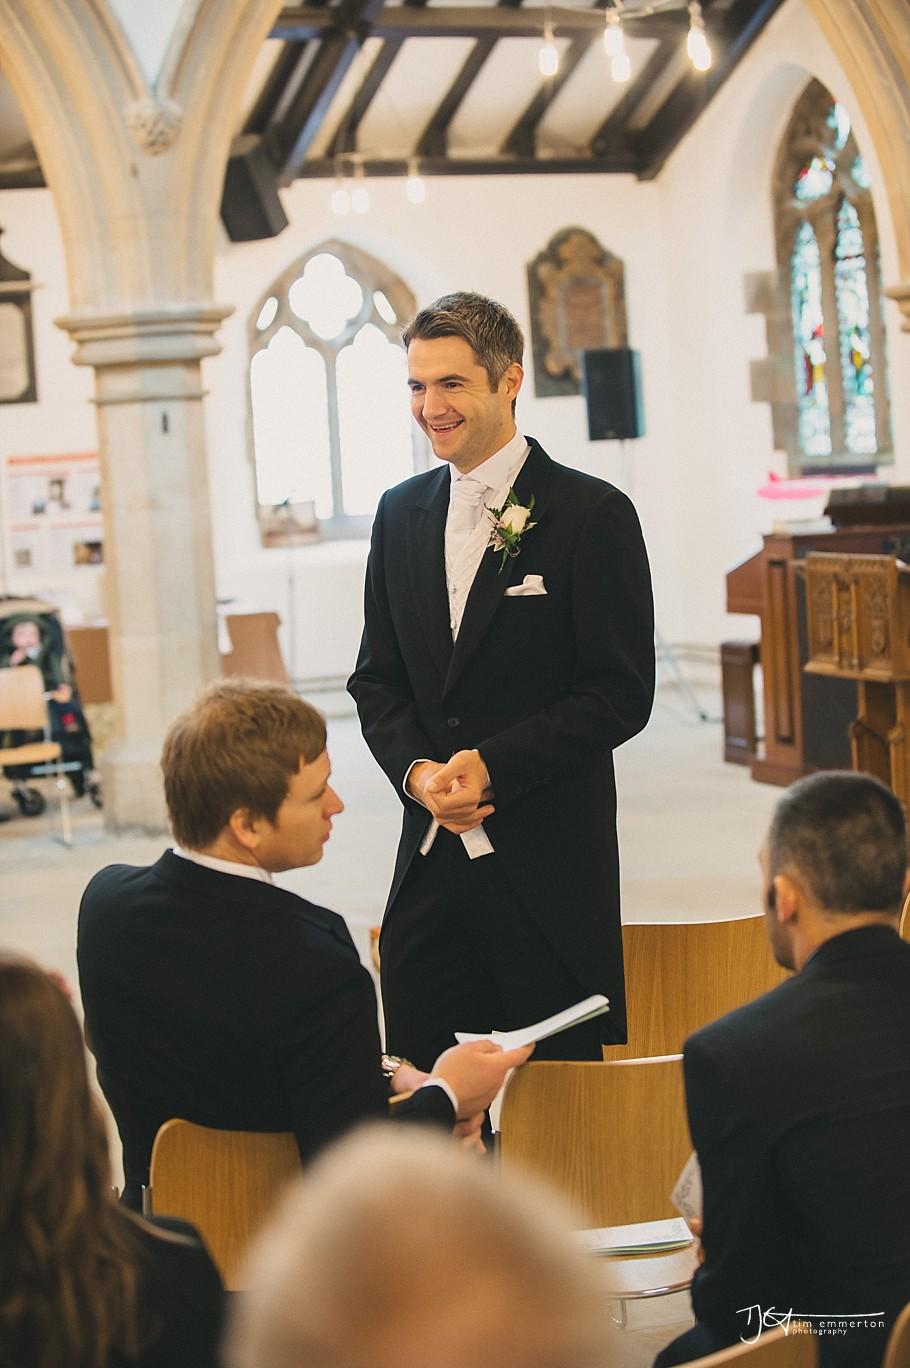 Samlesbury-Hall-Wedding-Photographer-053.jpg